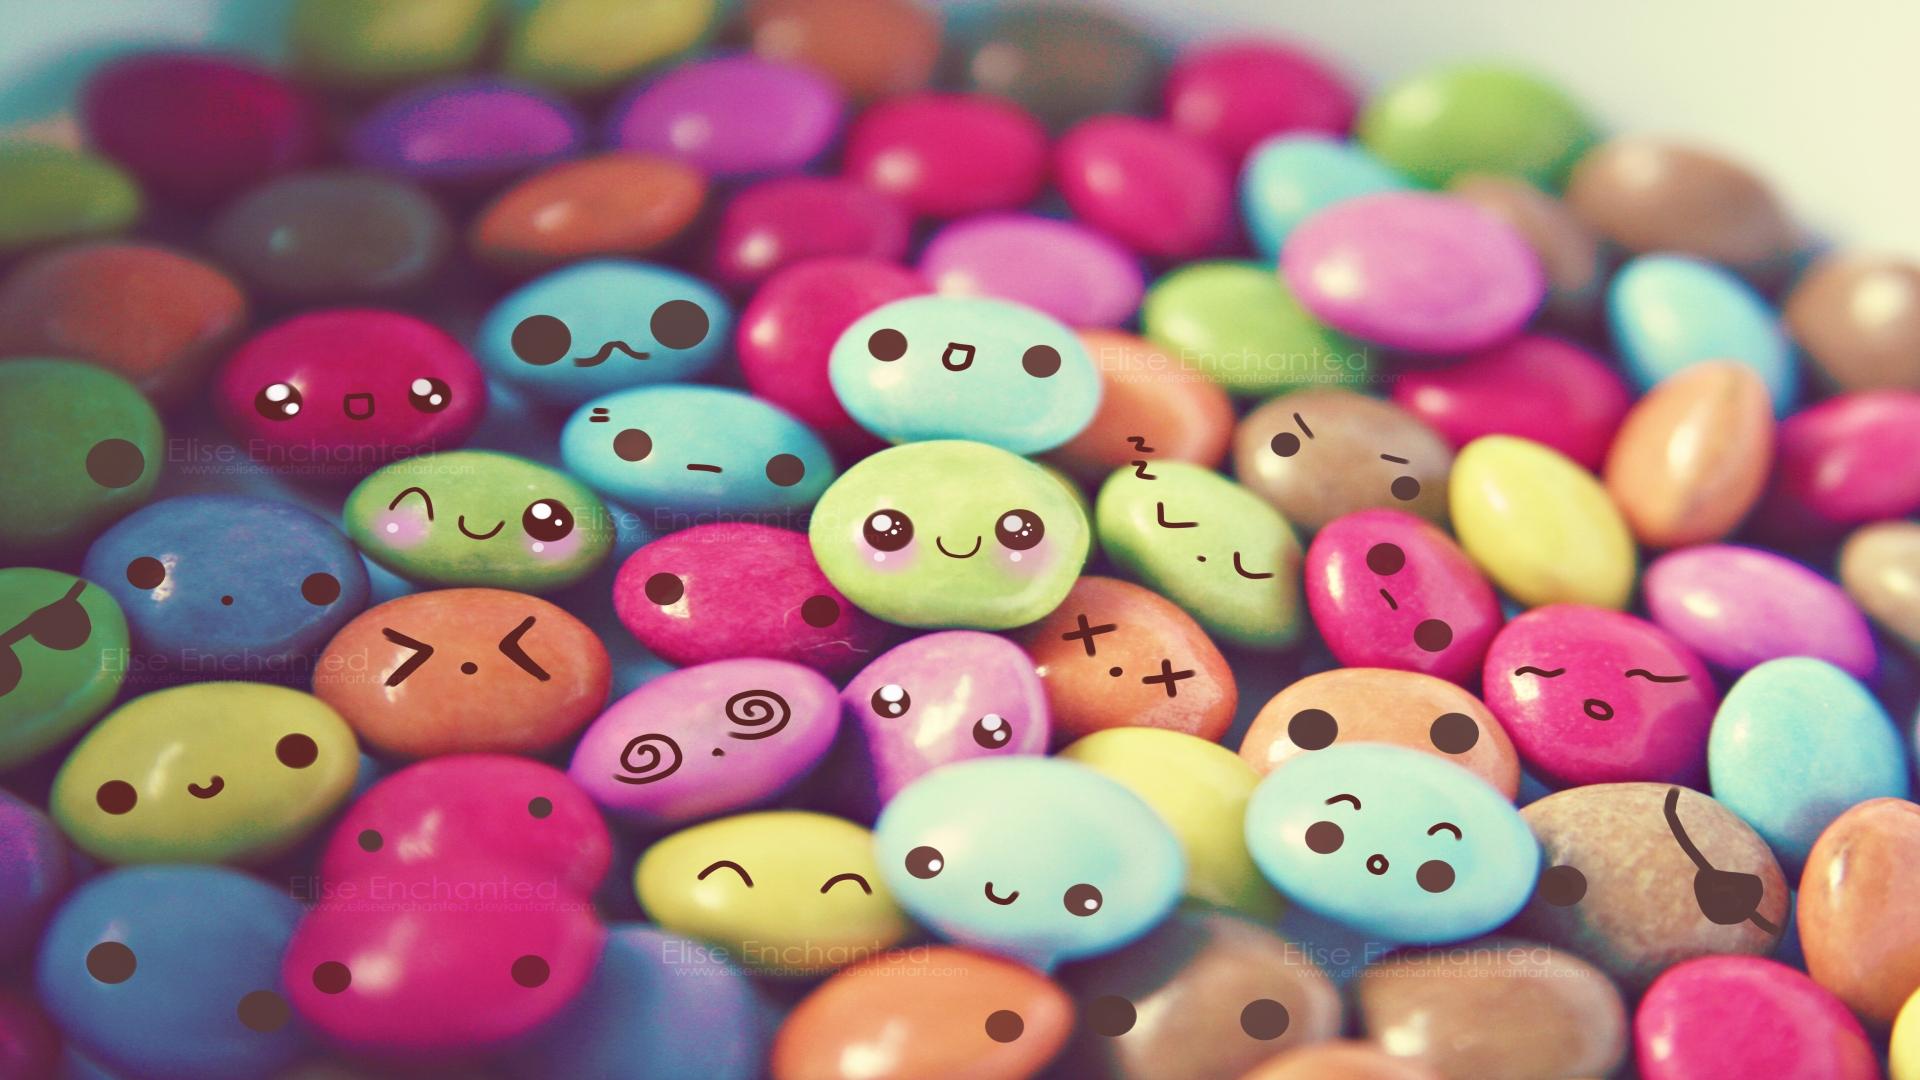 hinh-nen-cute-cho-may-tinh-dep-nhat-wallppaer-cute-14.jpg